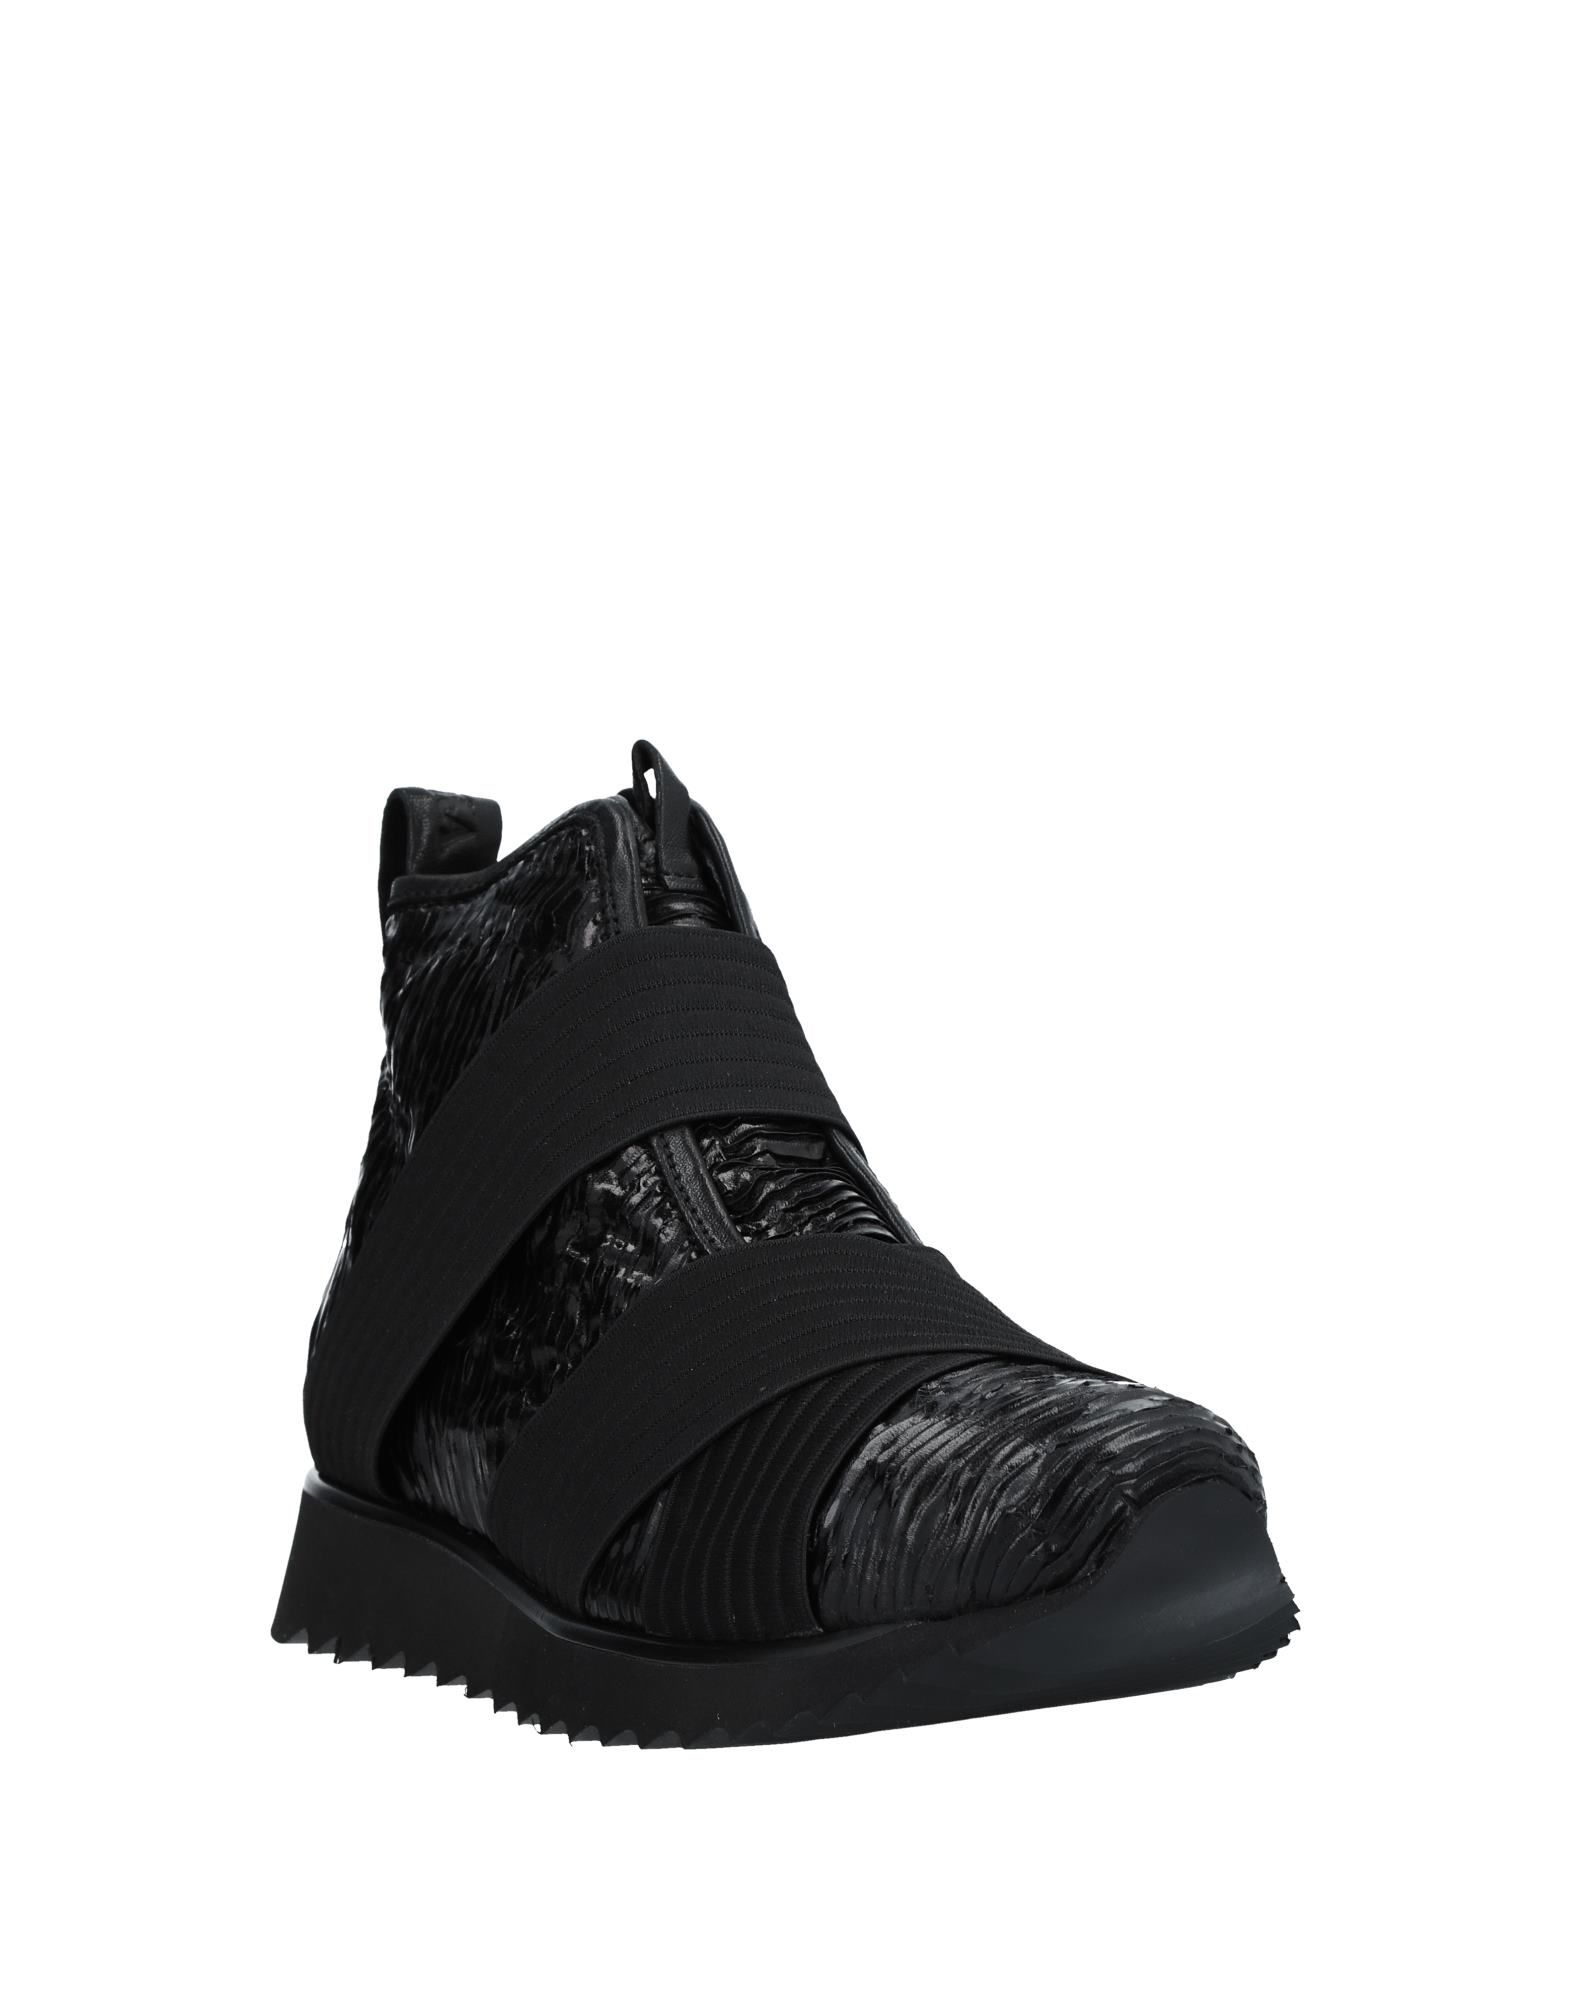 Gut um billige billige billige Schuhe zu tragenAndìa Fora Sneakers Damen  11530926SJ 1a1644